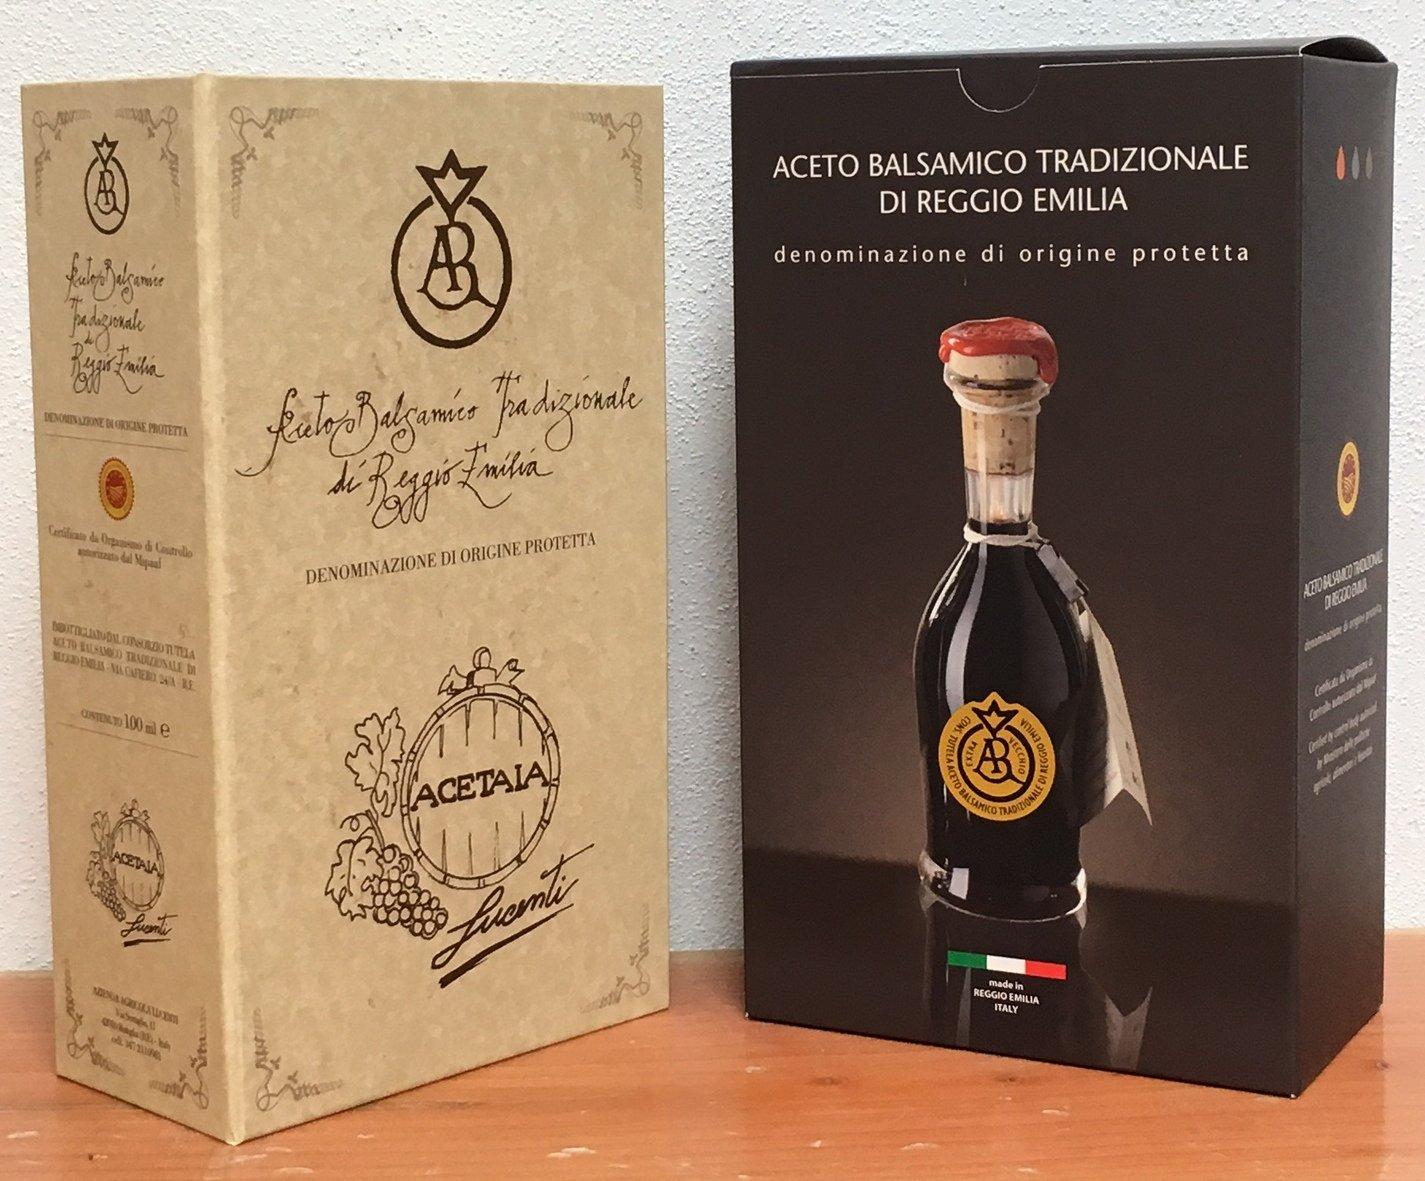 Traditional Balsamic Vinegar of Reggio Emilia PDO ''Golden Seal'', 3,5 oz. Least 25 years old + glass tic